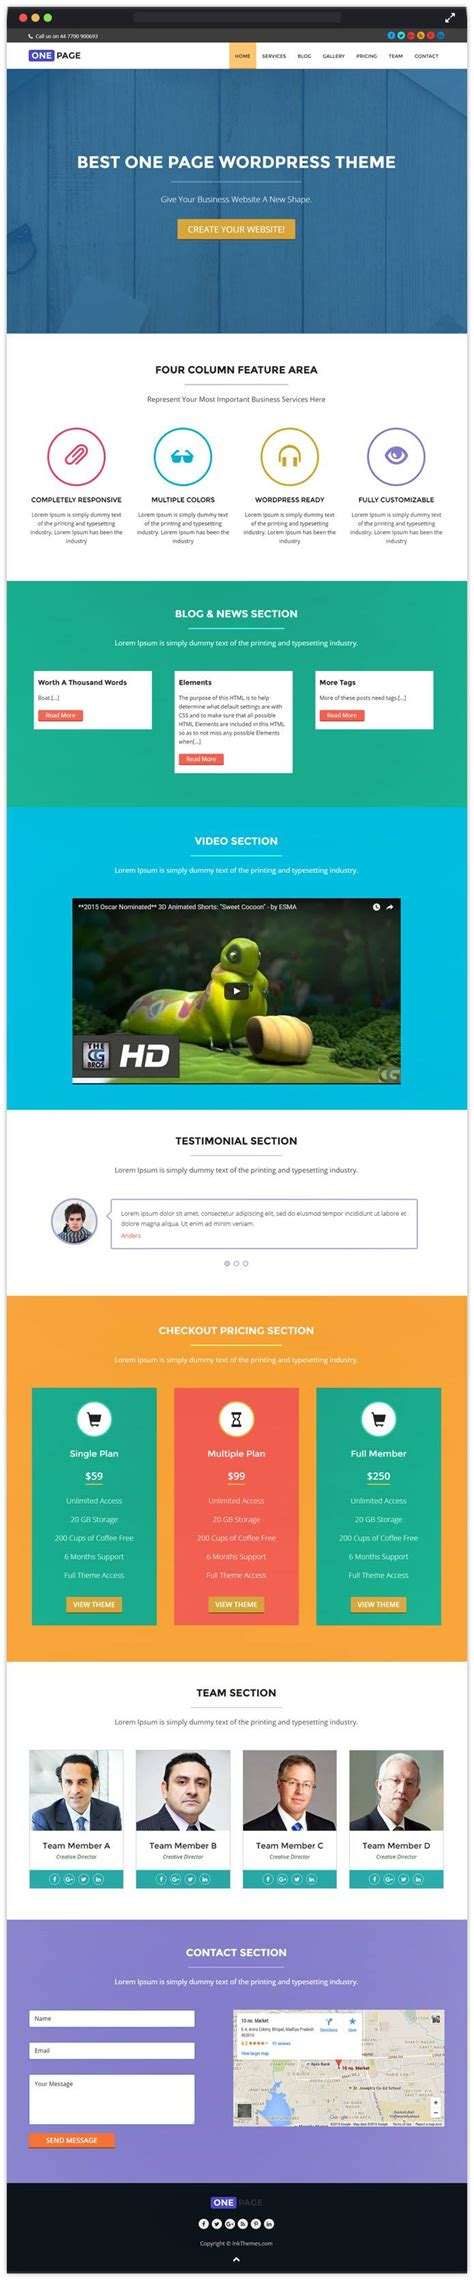 create website   page wordpress theme tutorial